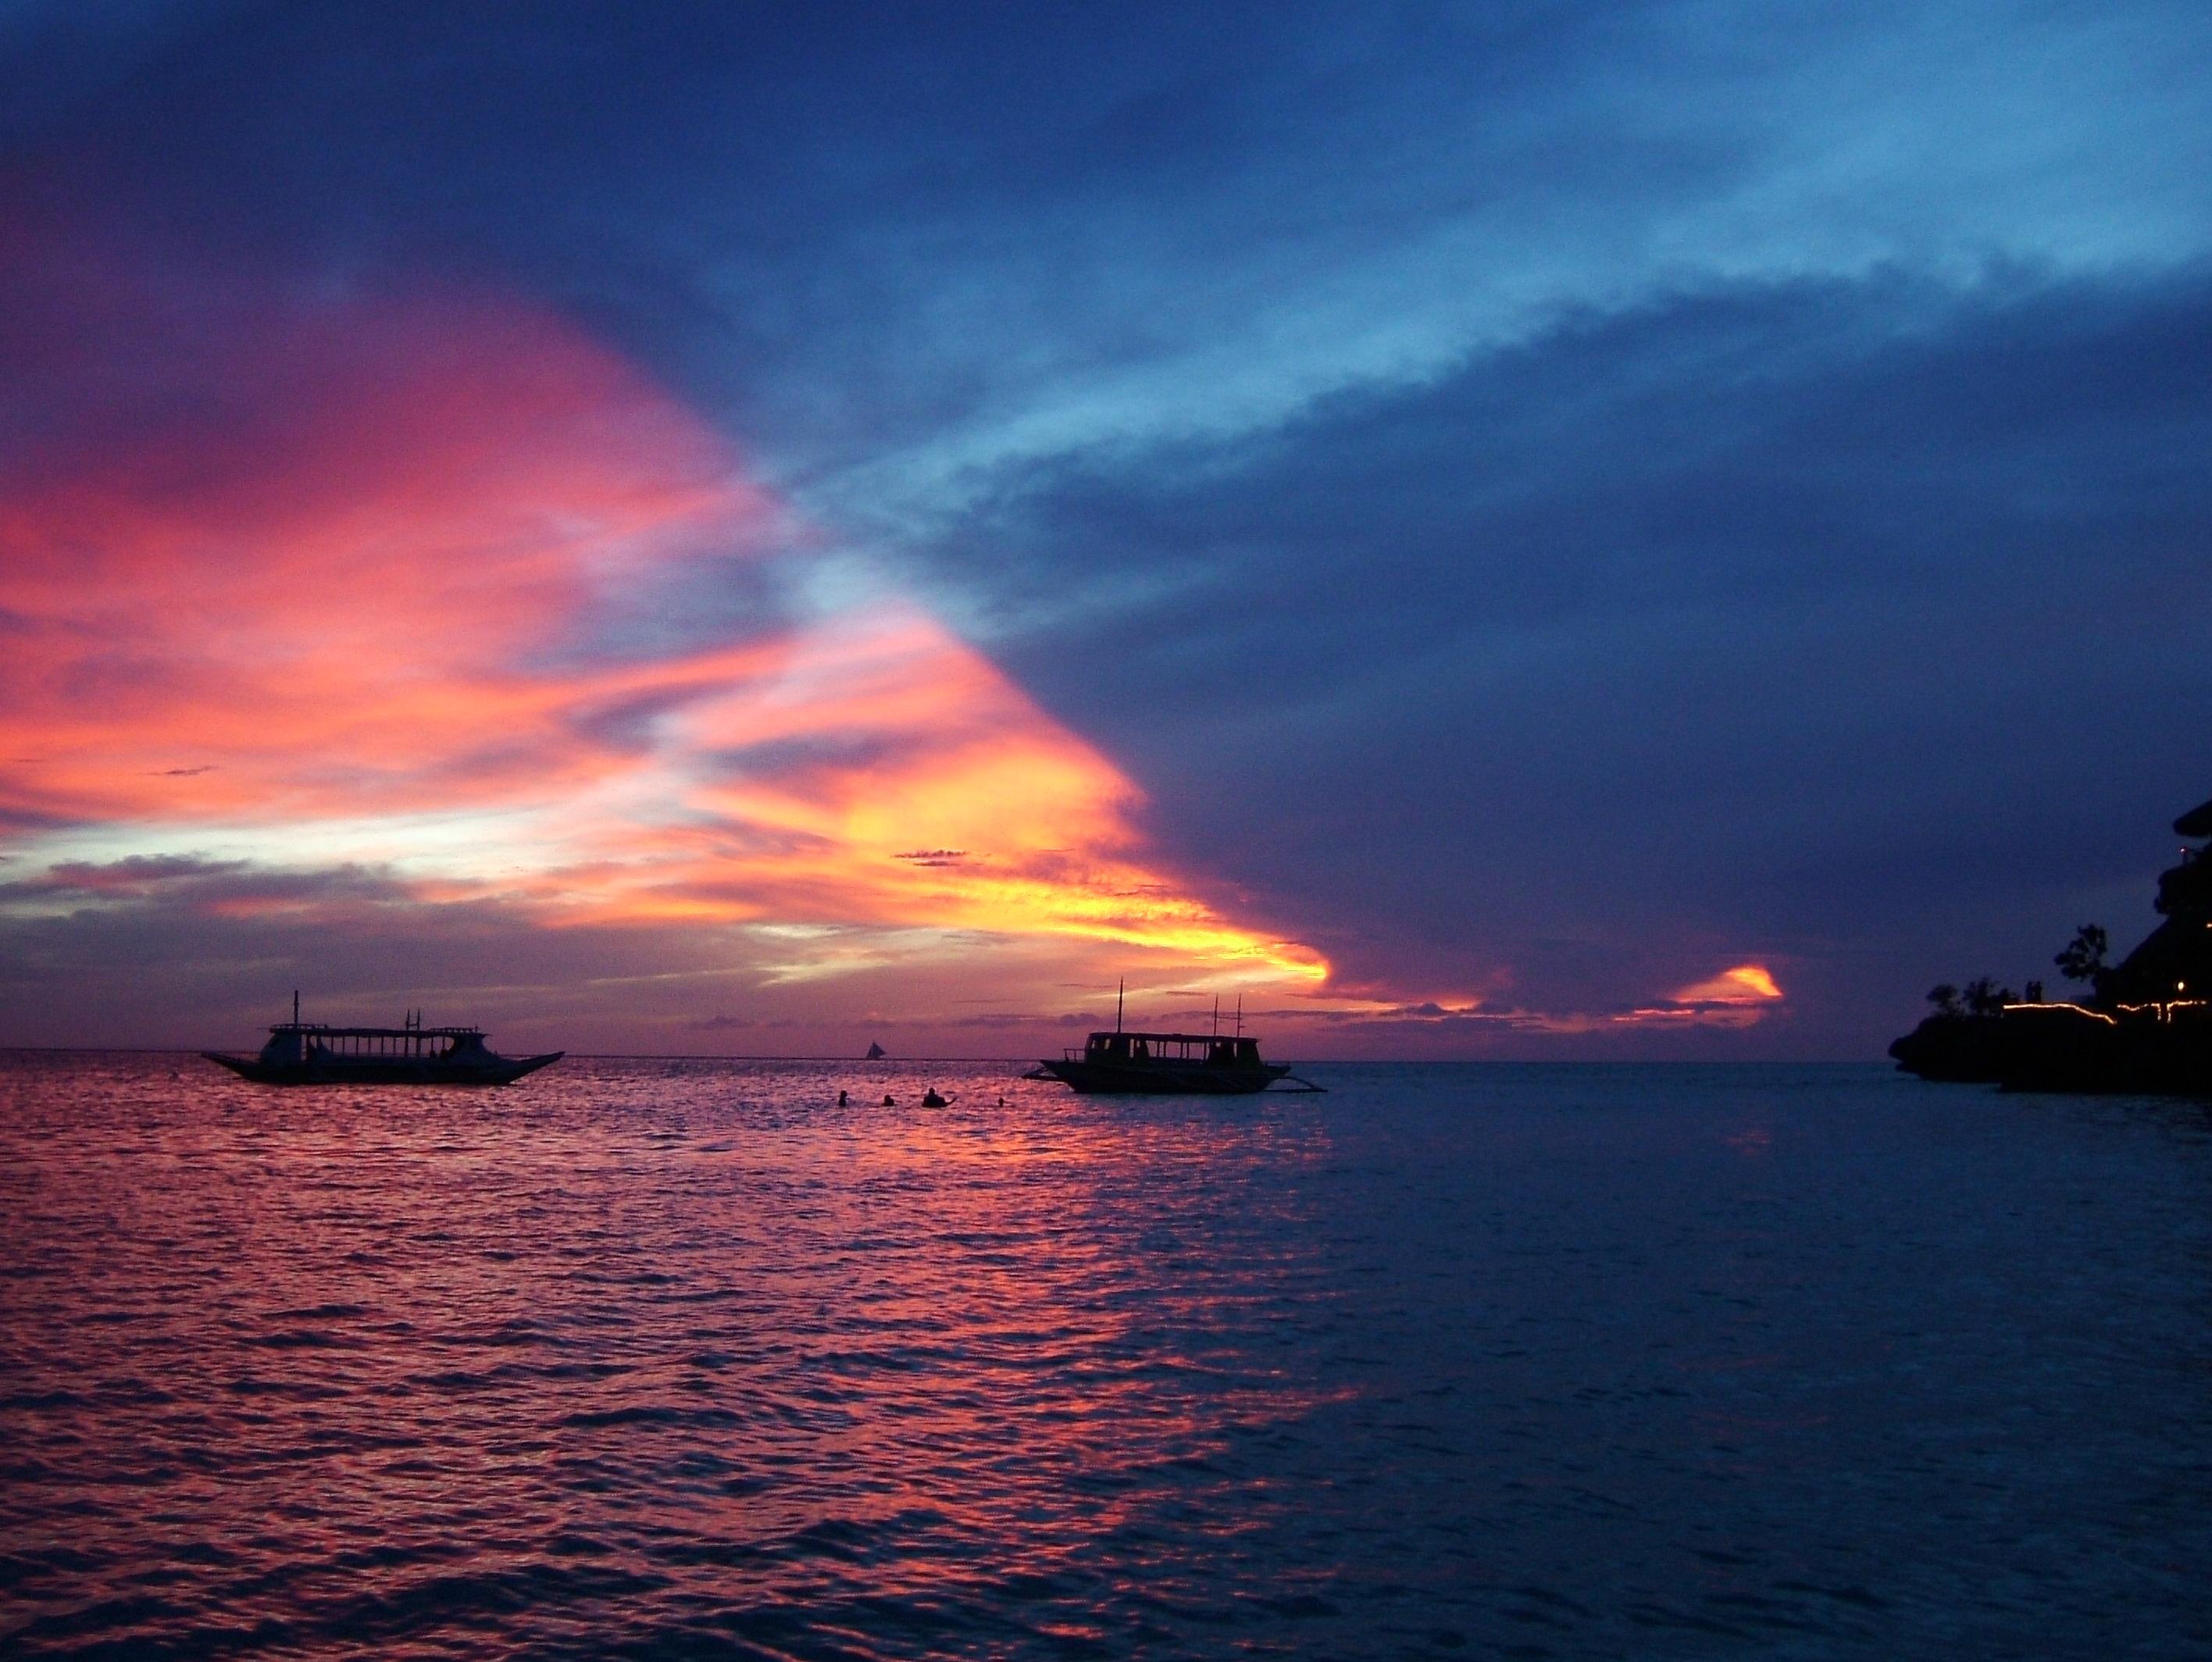 Sunset Philippines Boracay Beach 01